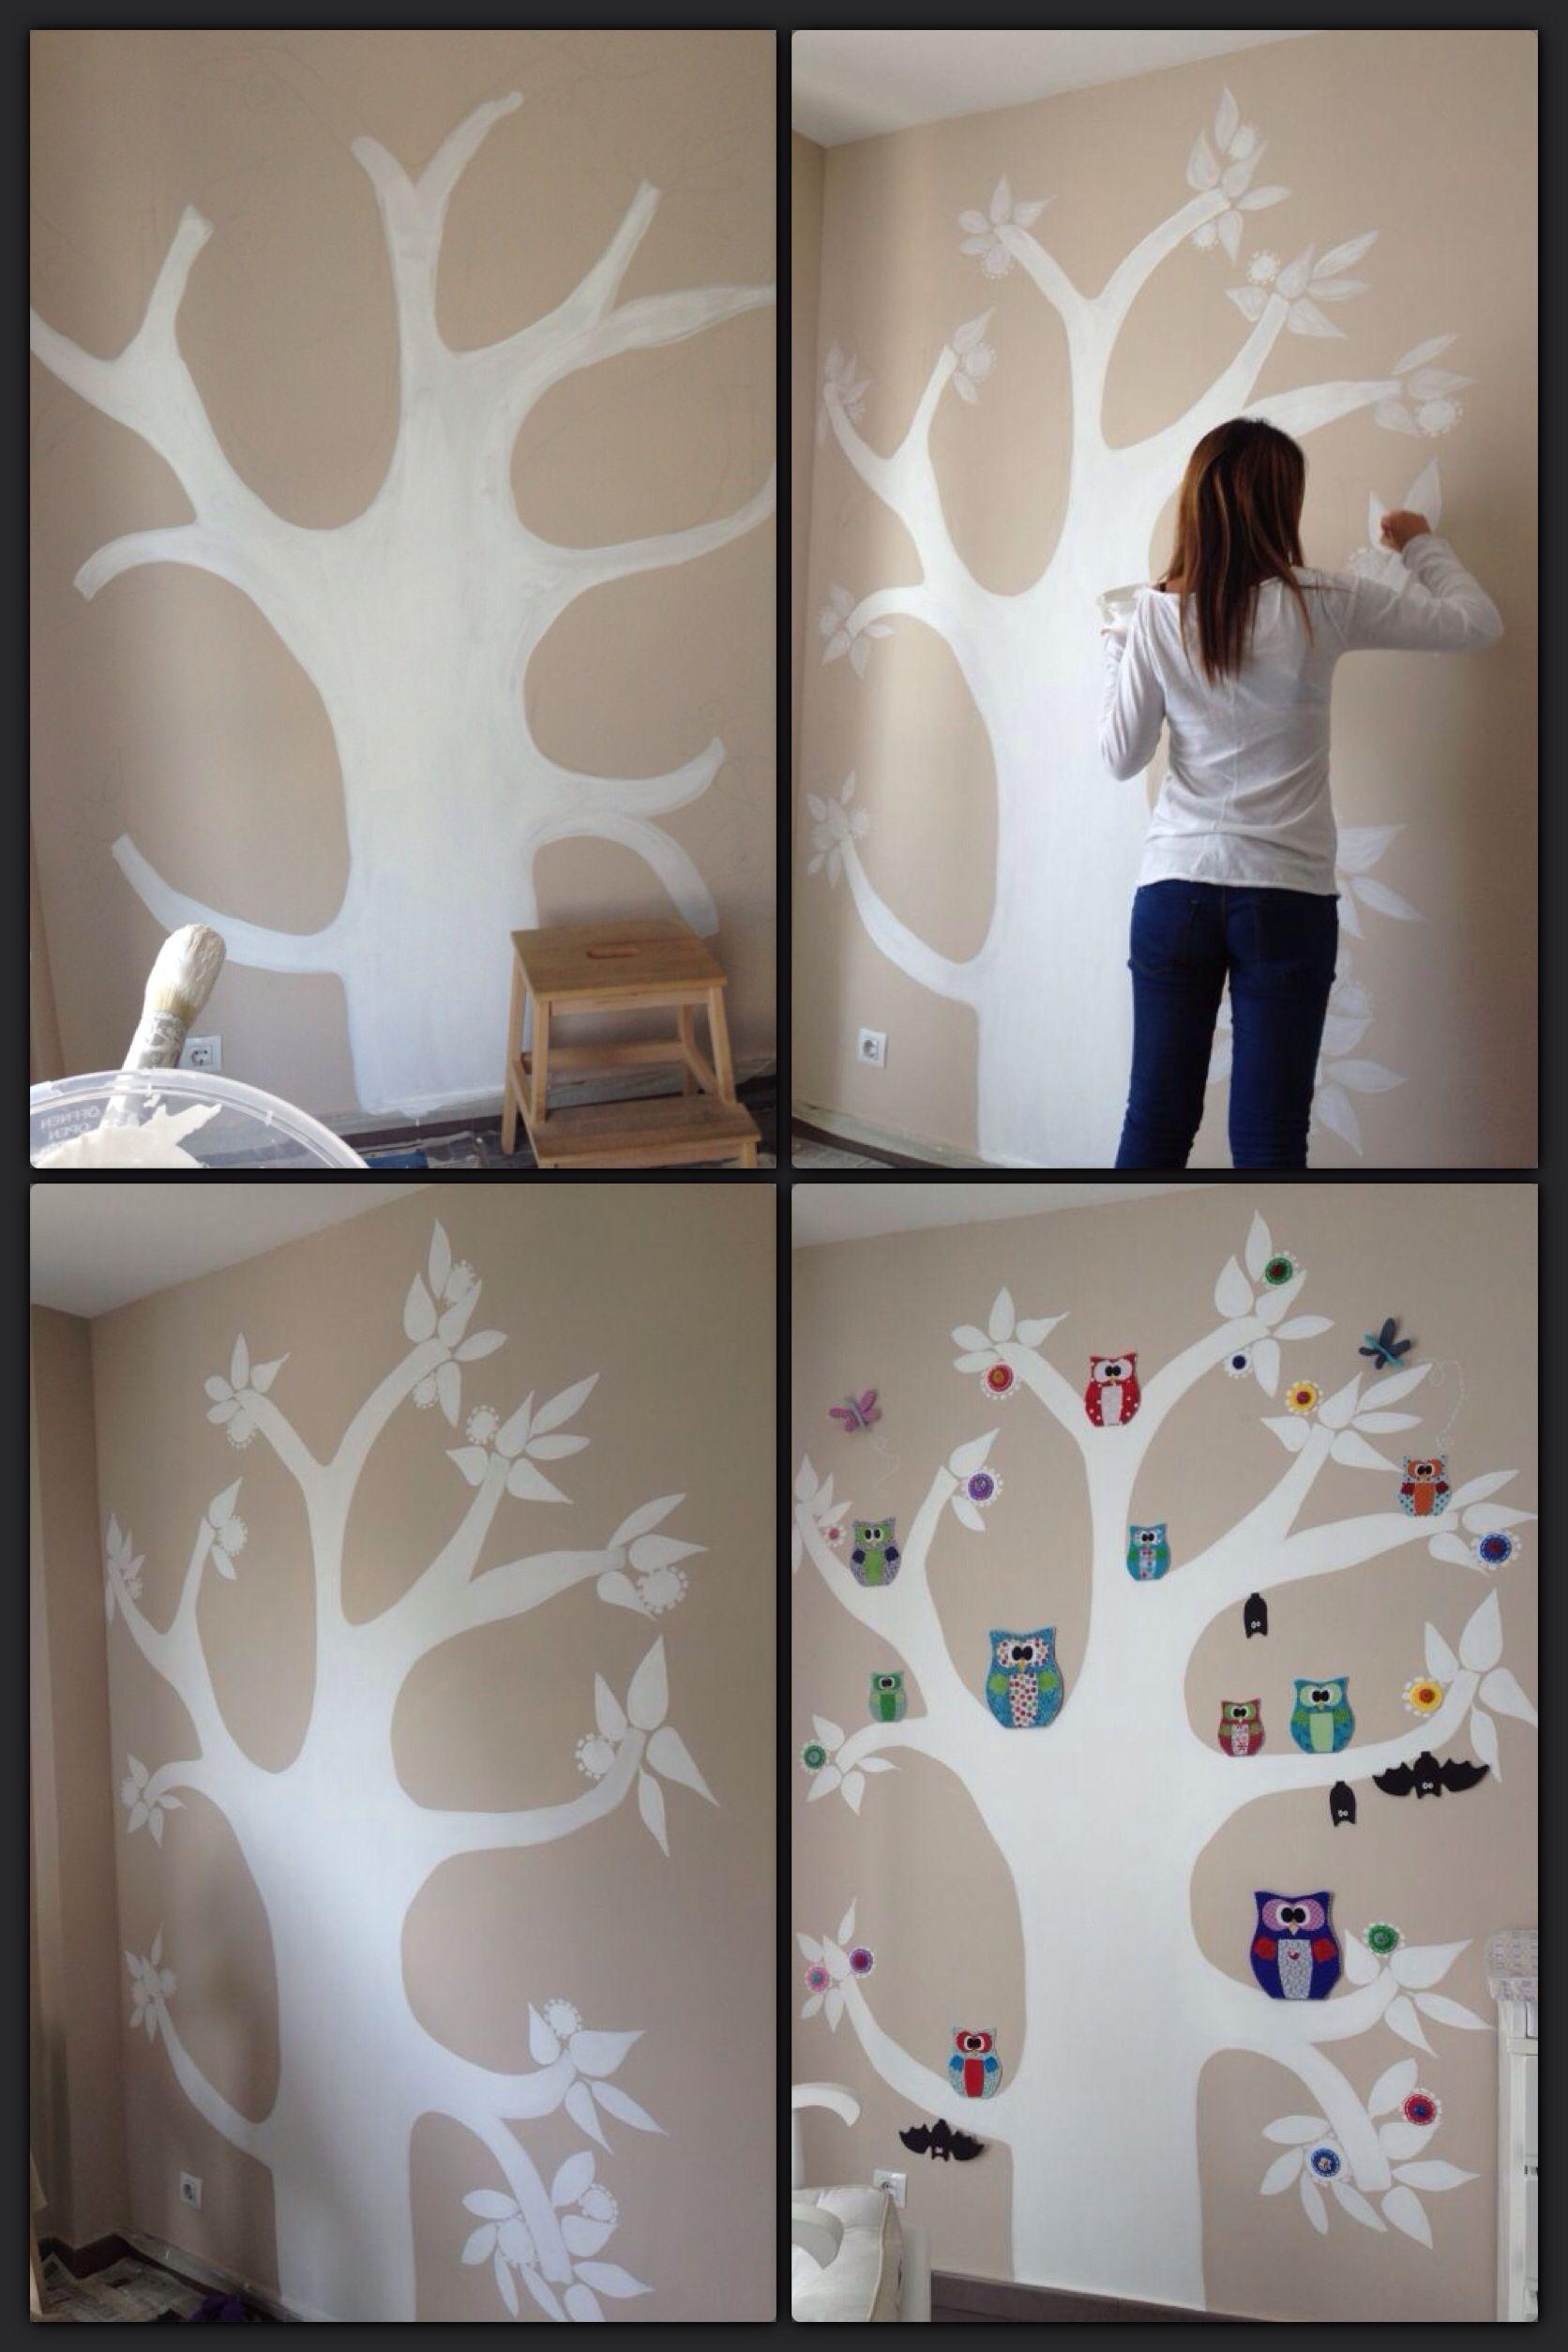 Pintura mural en dormitorio infantil - Decoracion infantil habitacion ...